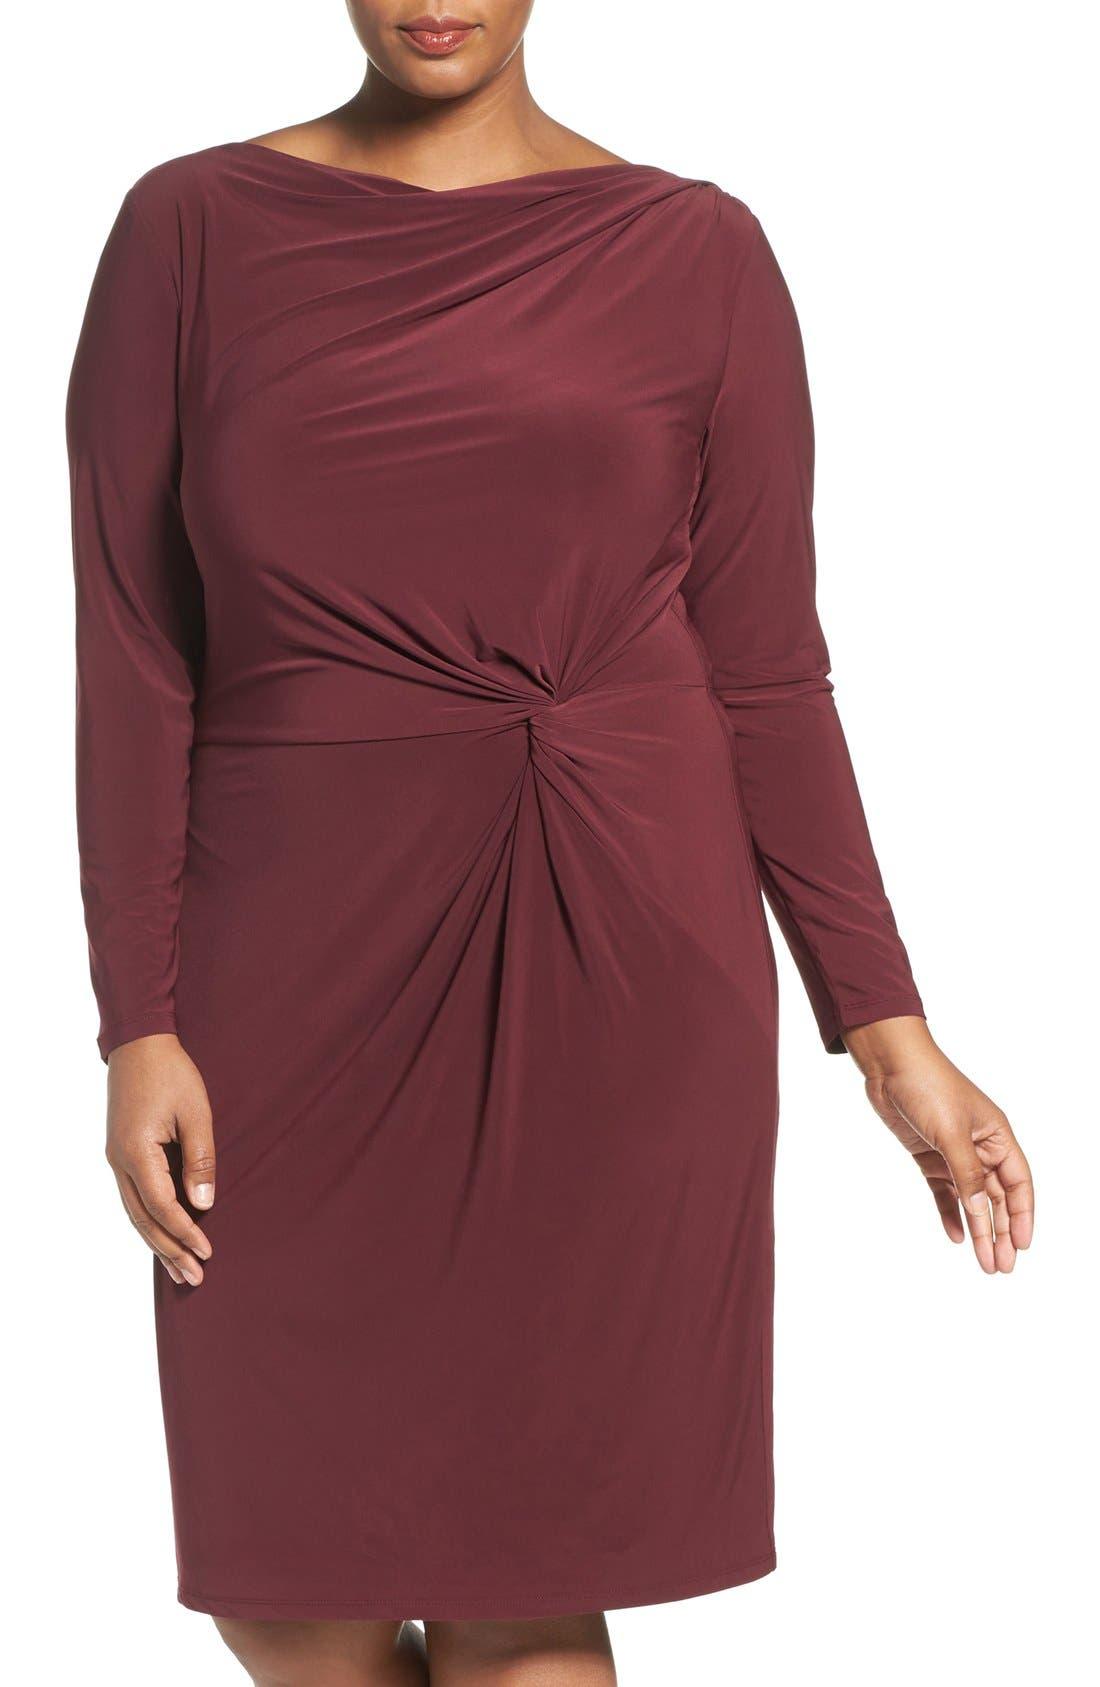 ADRIANNA PAPELL Knot Front Drape Jersey Dress